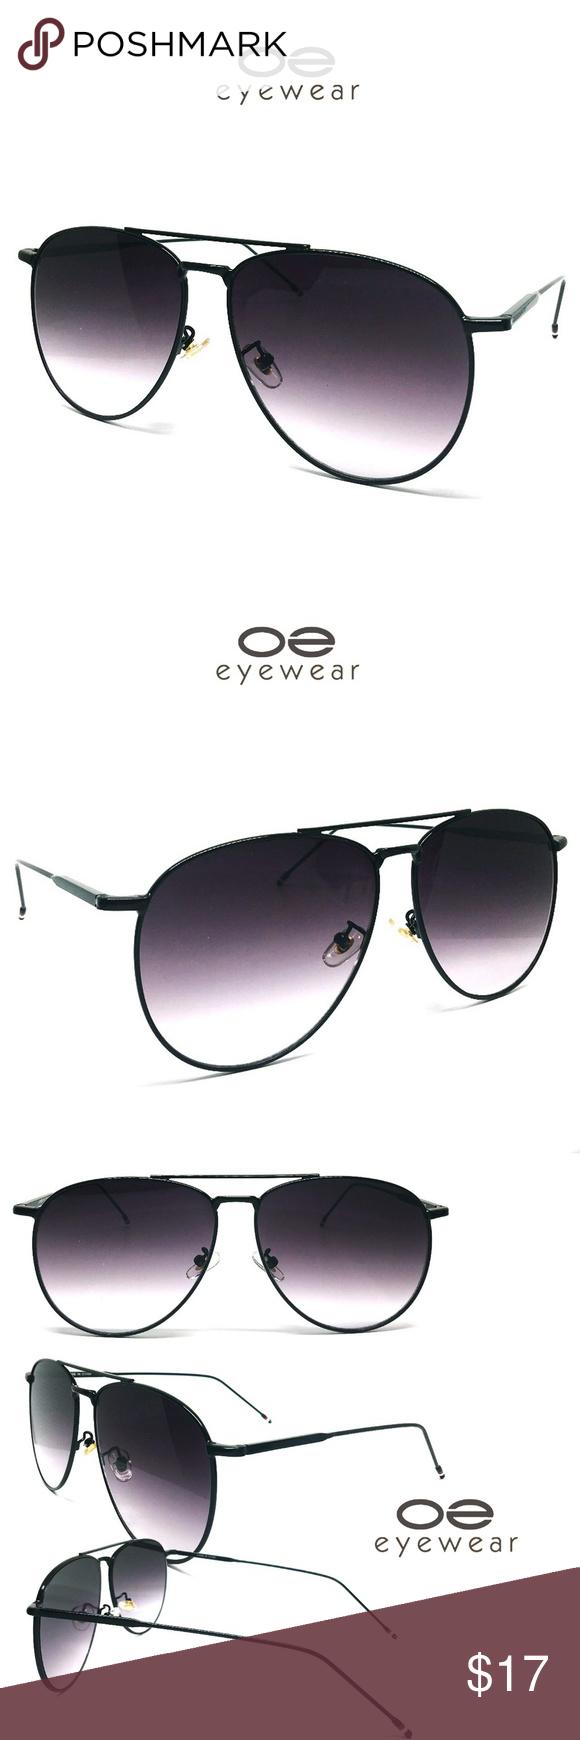 c093abe87f O2 Eyewear 97025 Oversized Flat Aviator Sunglasses OVERSIZED Lightweight Premium  Aviator For Superior Comfort frame